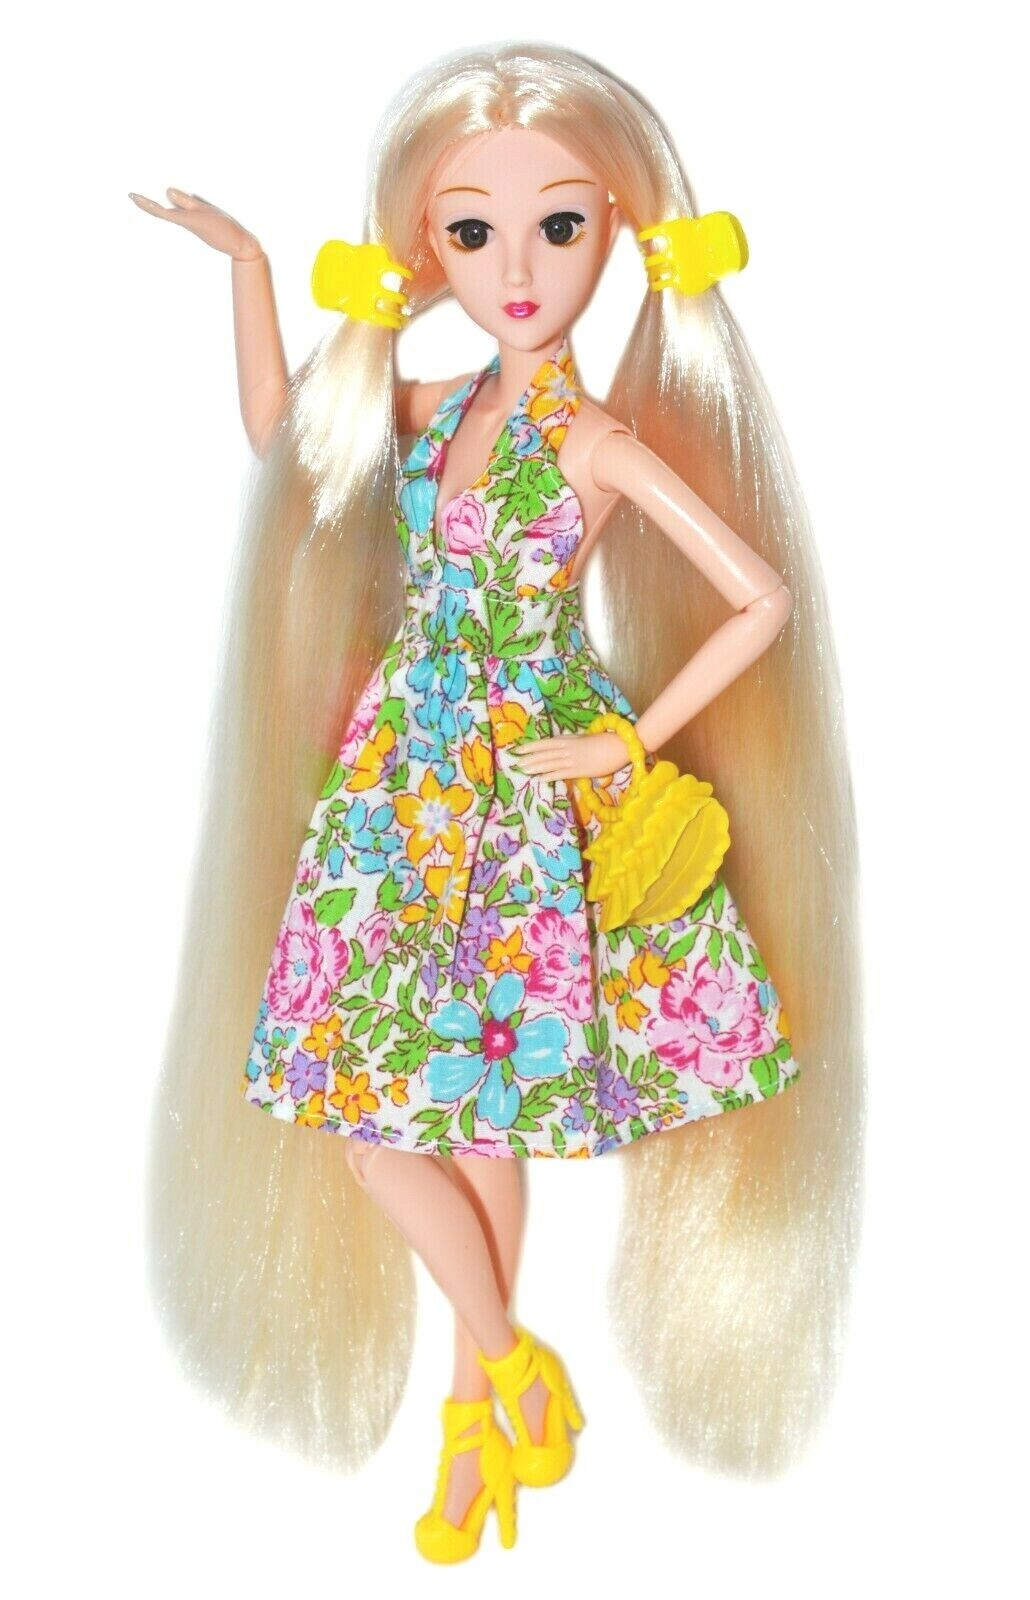 Eledoll Antheia Poseable Fashion Doll Very Long Hair 3D Eyes